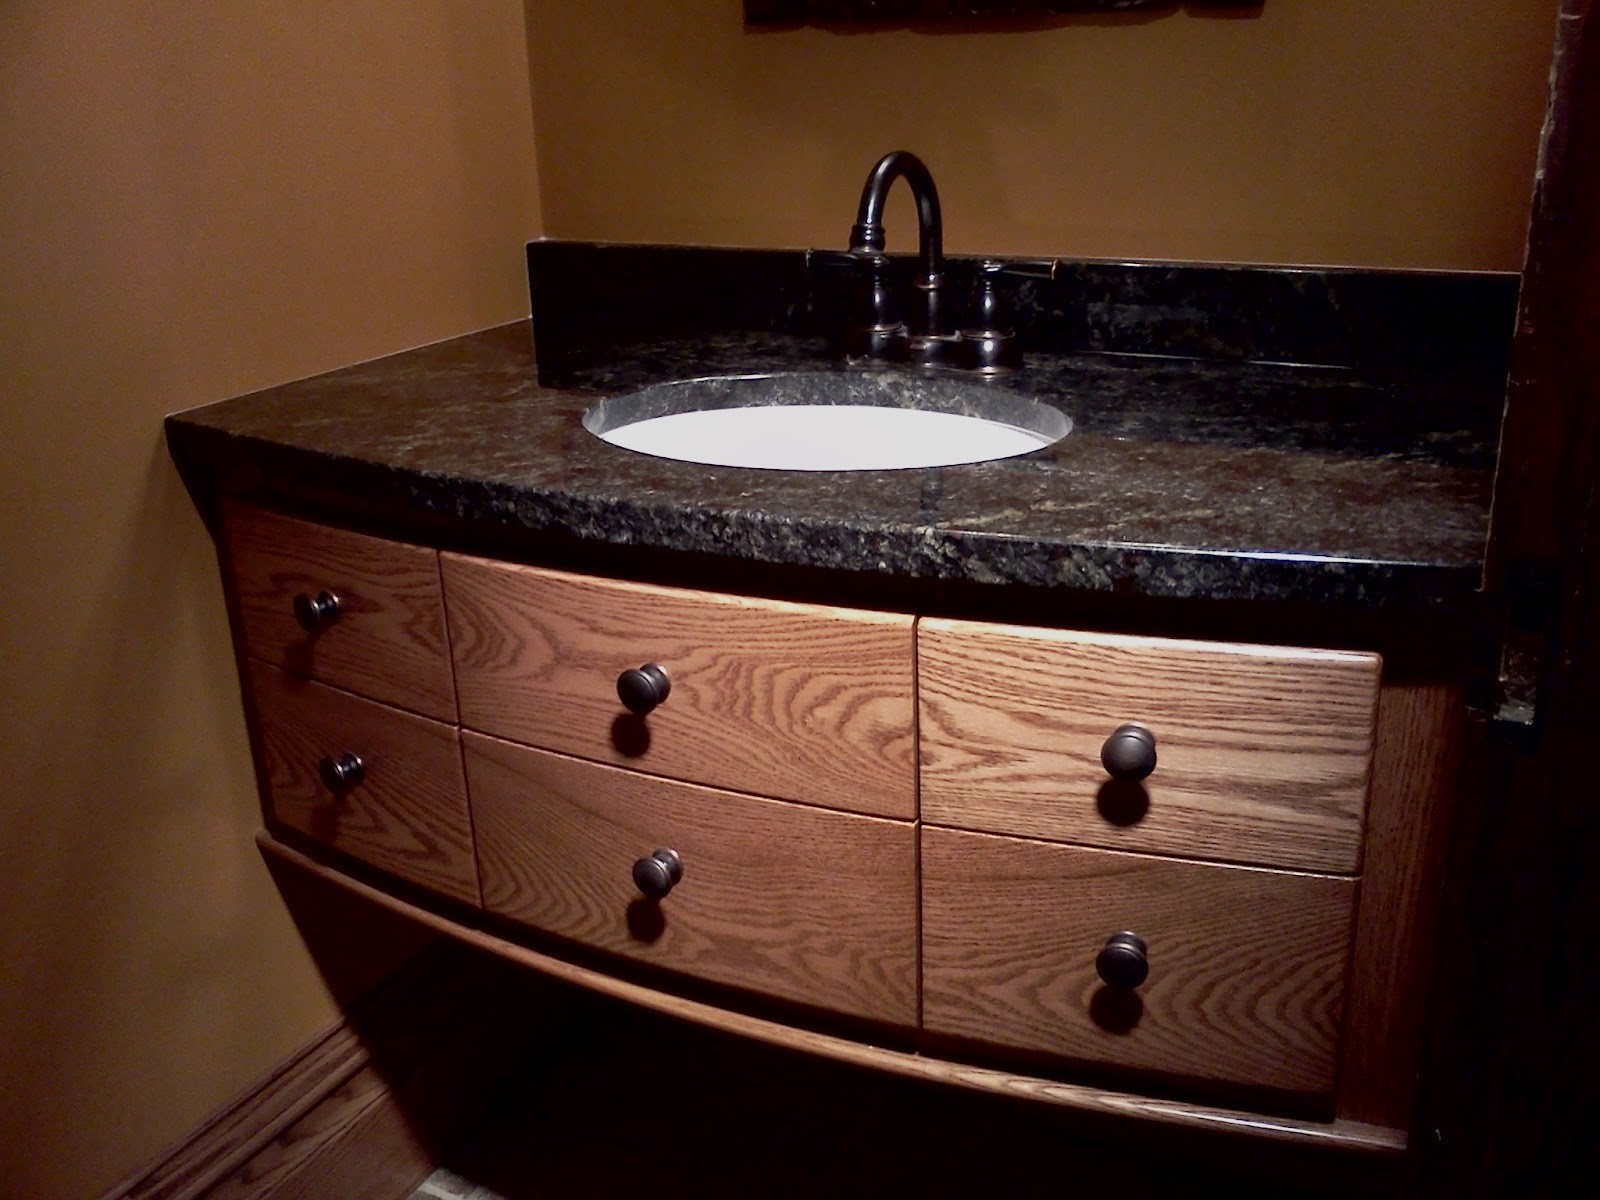 Bathroom Vanity with top Best Of Excellent Black Granite with Six Drawers Teak Wood Materials at Plan